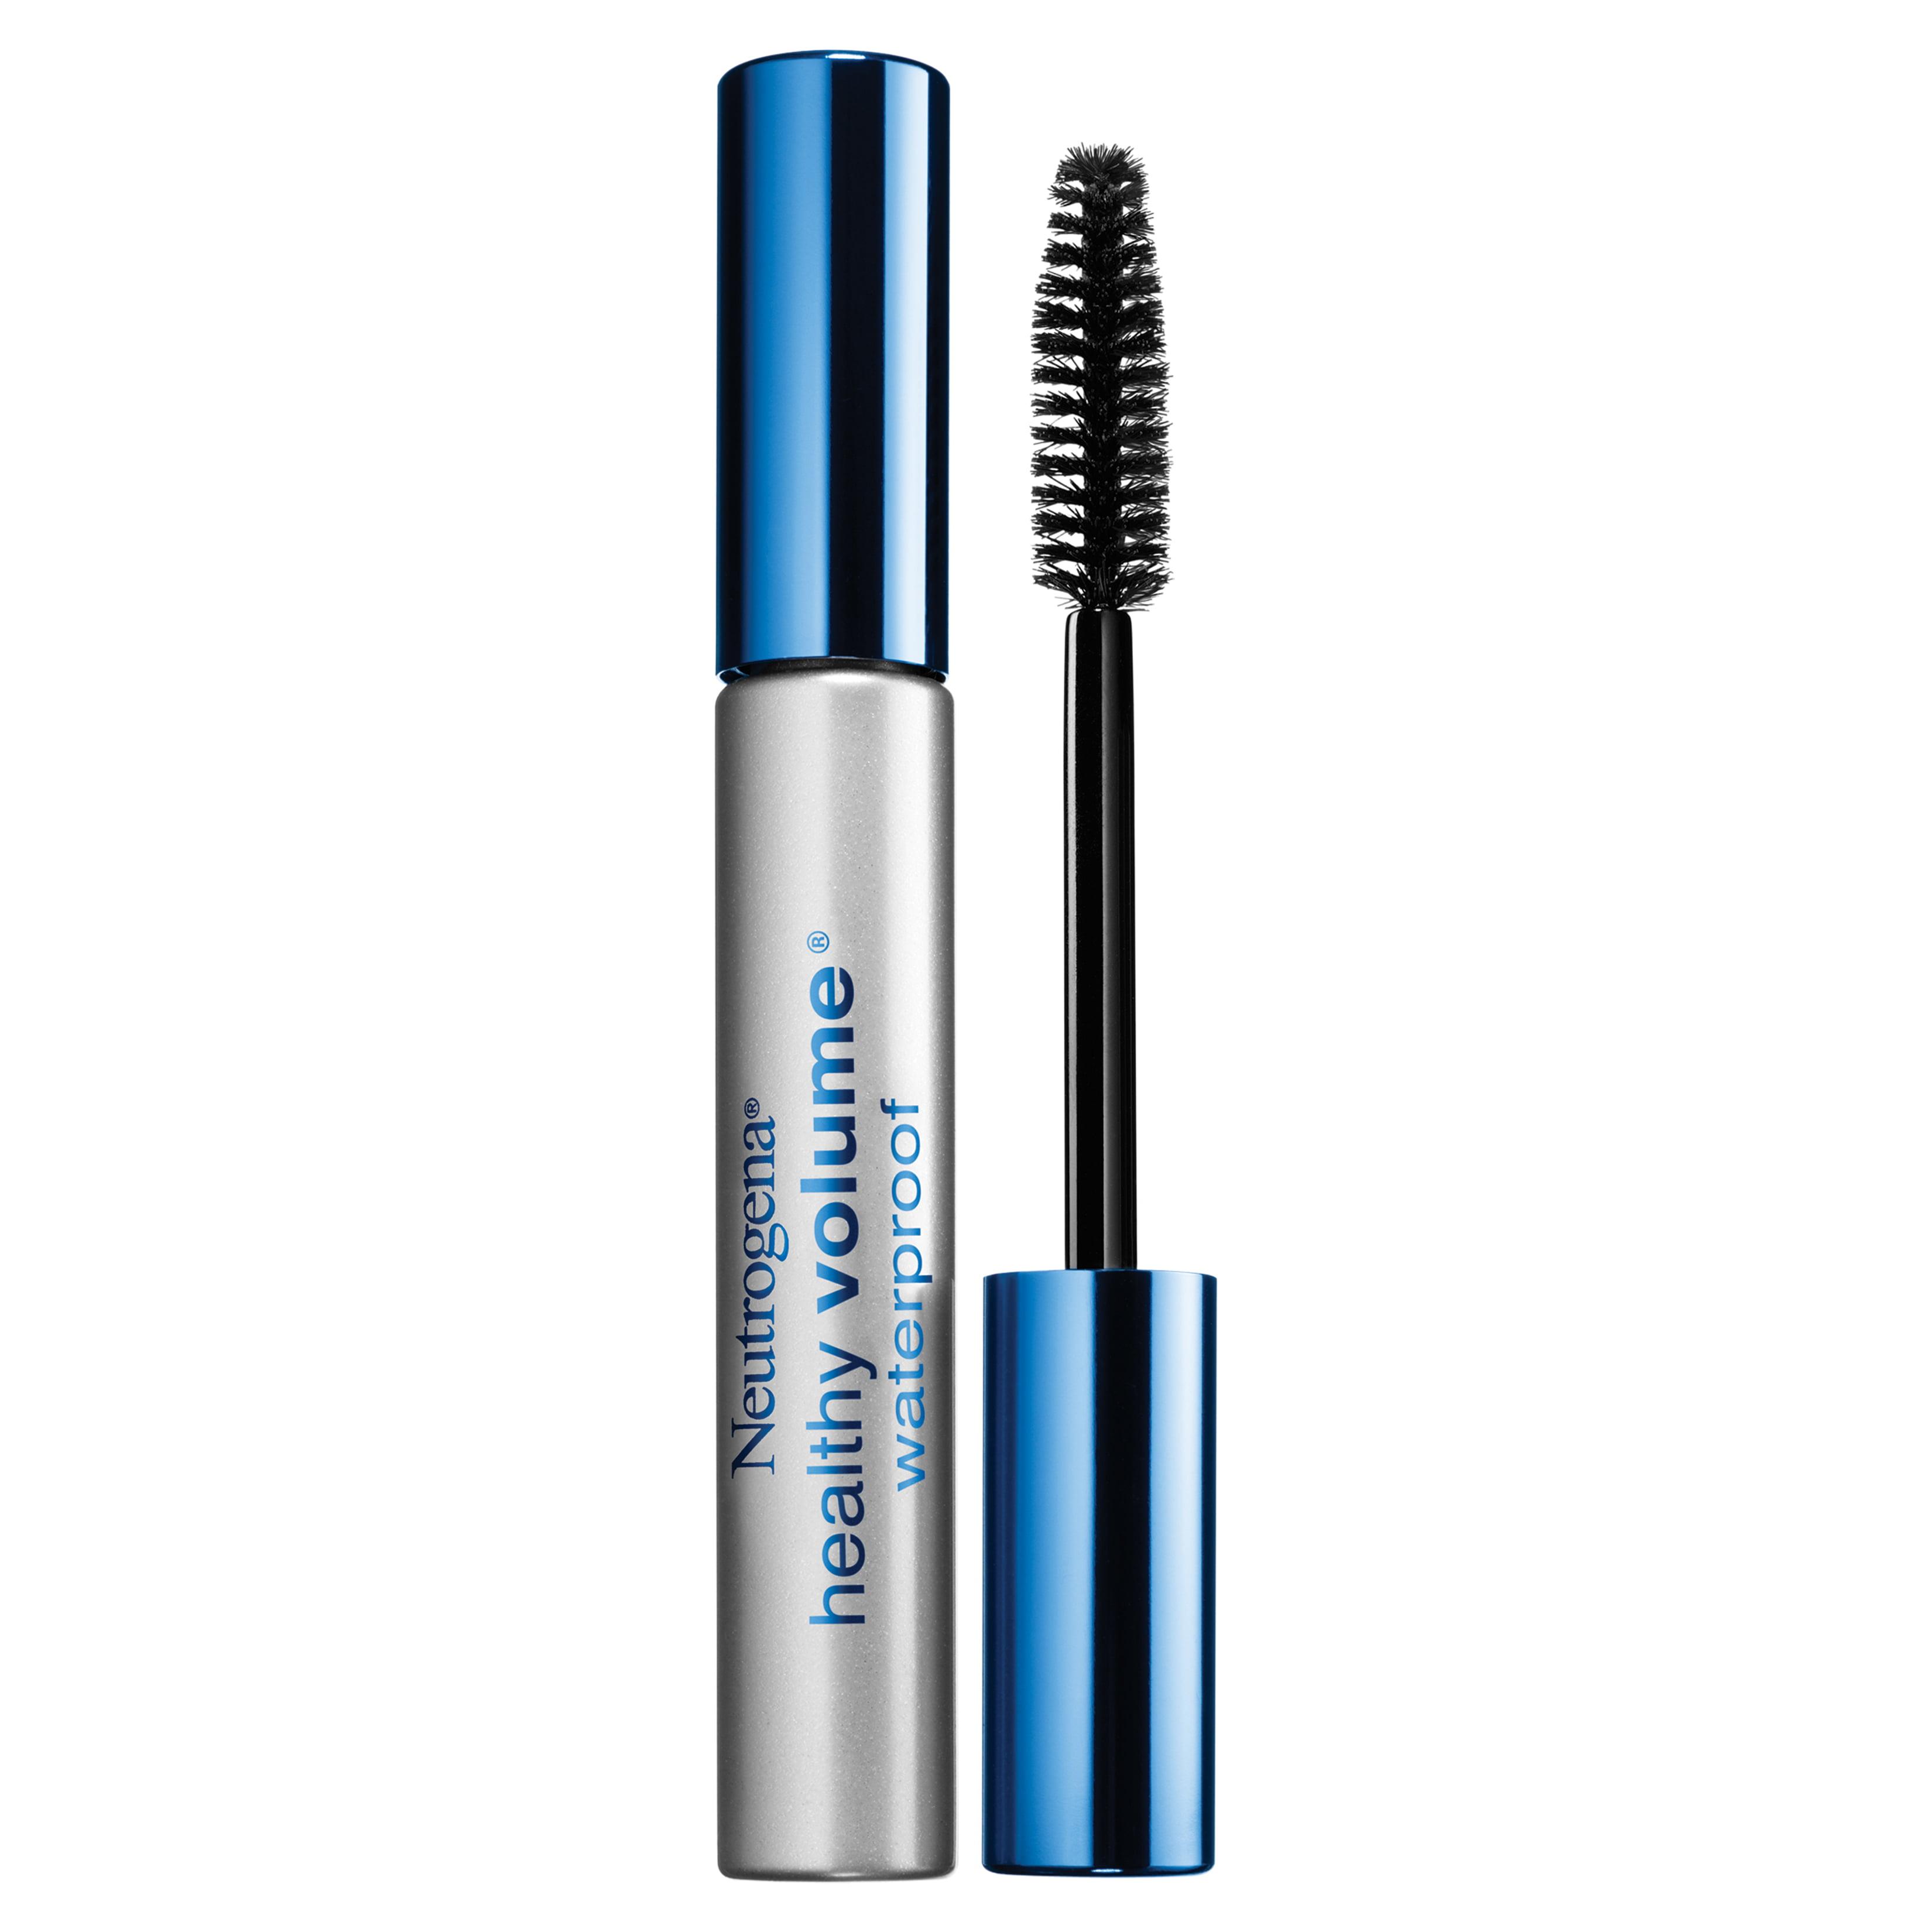 Neutrogena Healthy Volume Waterproof Mascara, Carbon Black 06,.21 Oz.